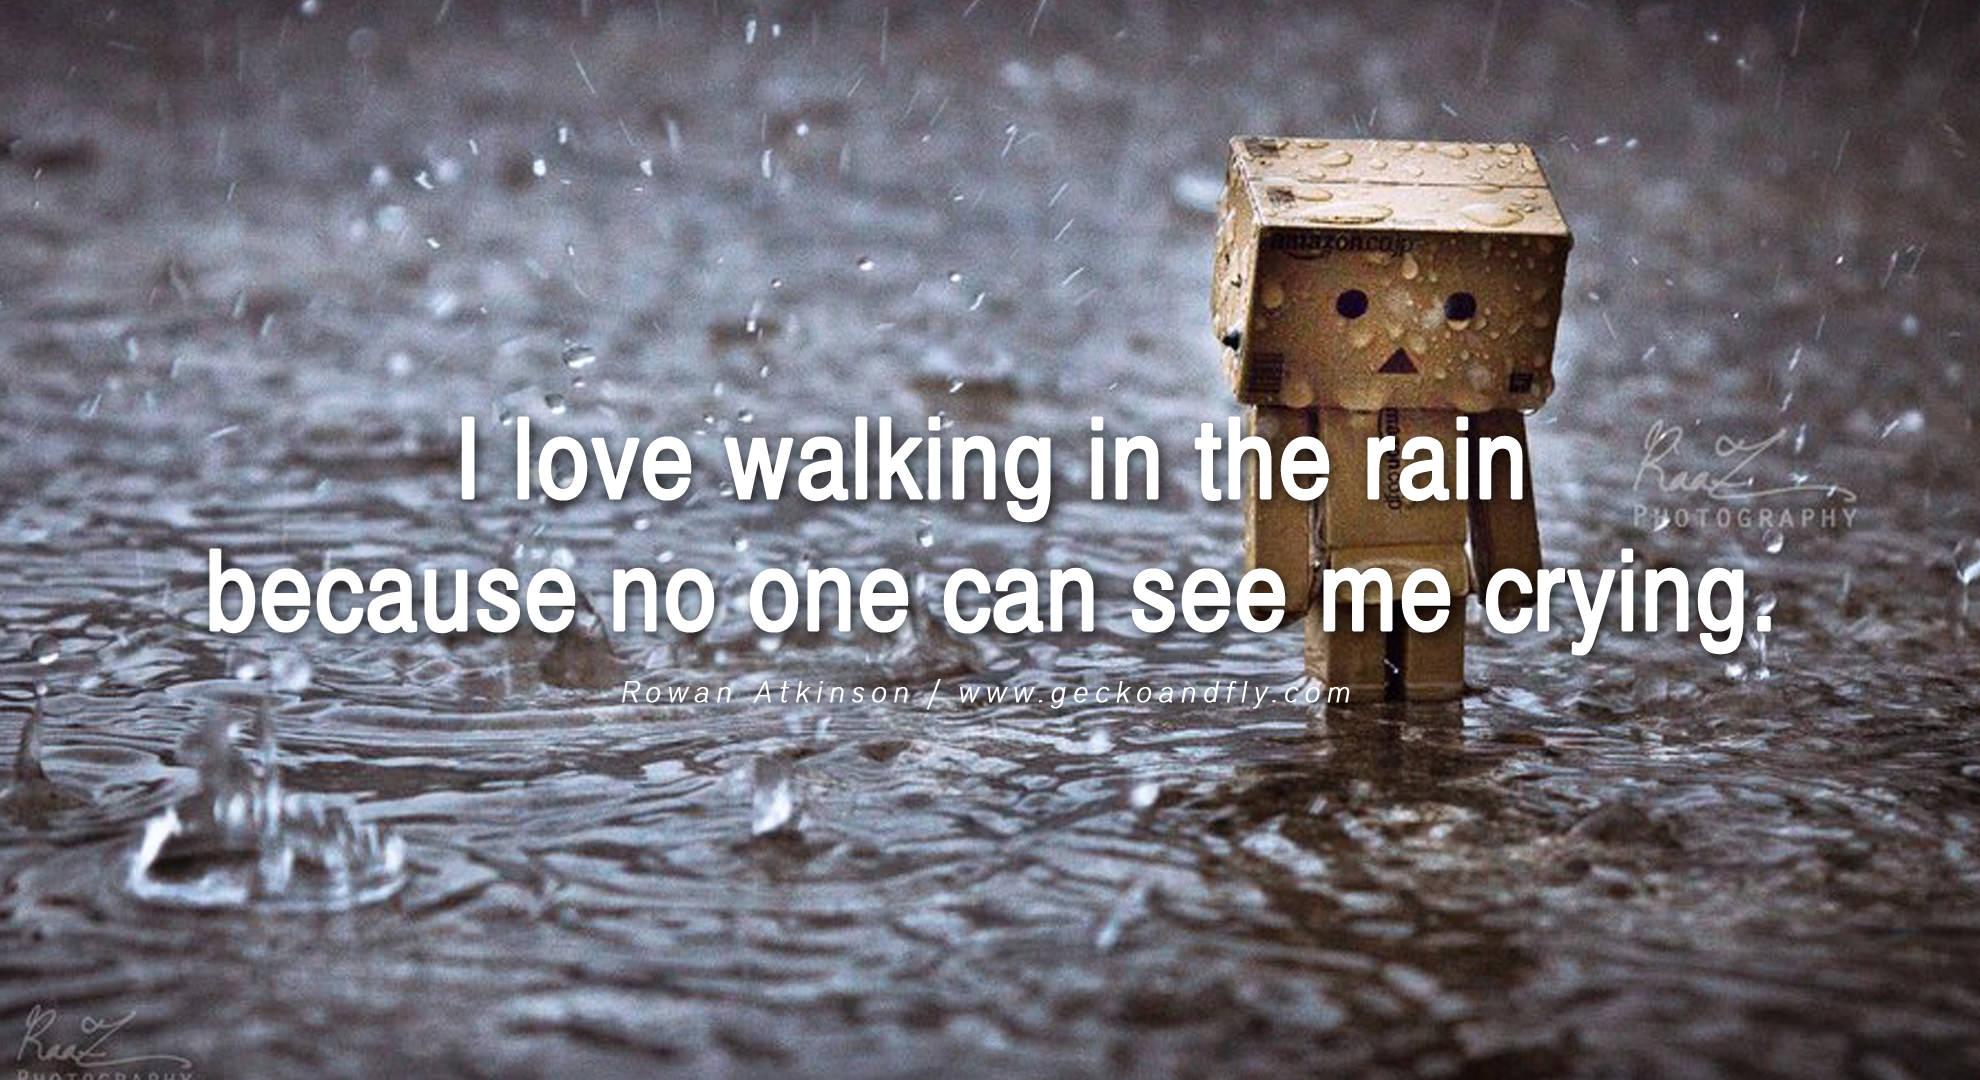 rain quotes romantic - photo #12